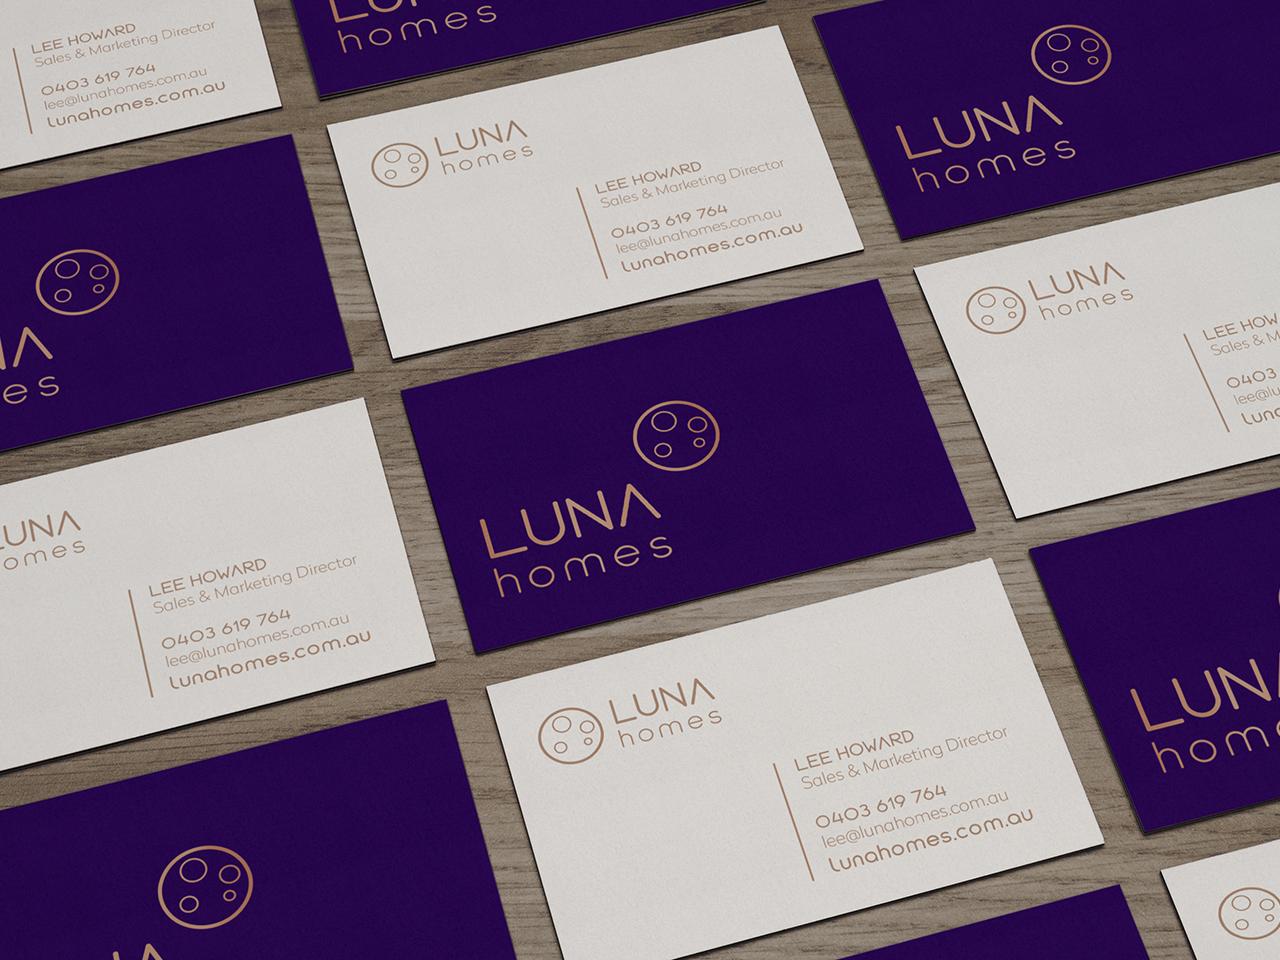 LUNA HOMES - Business Card